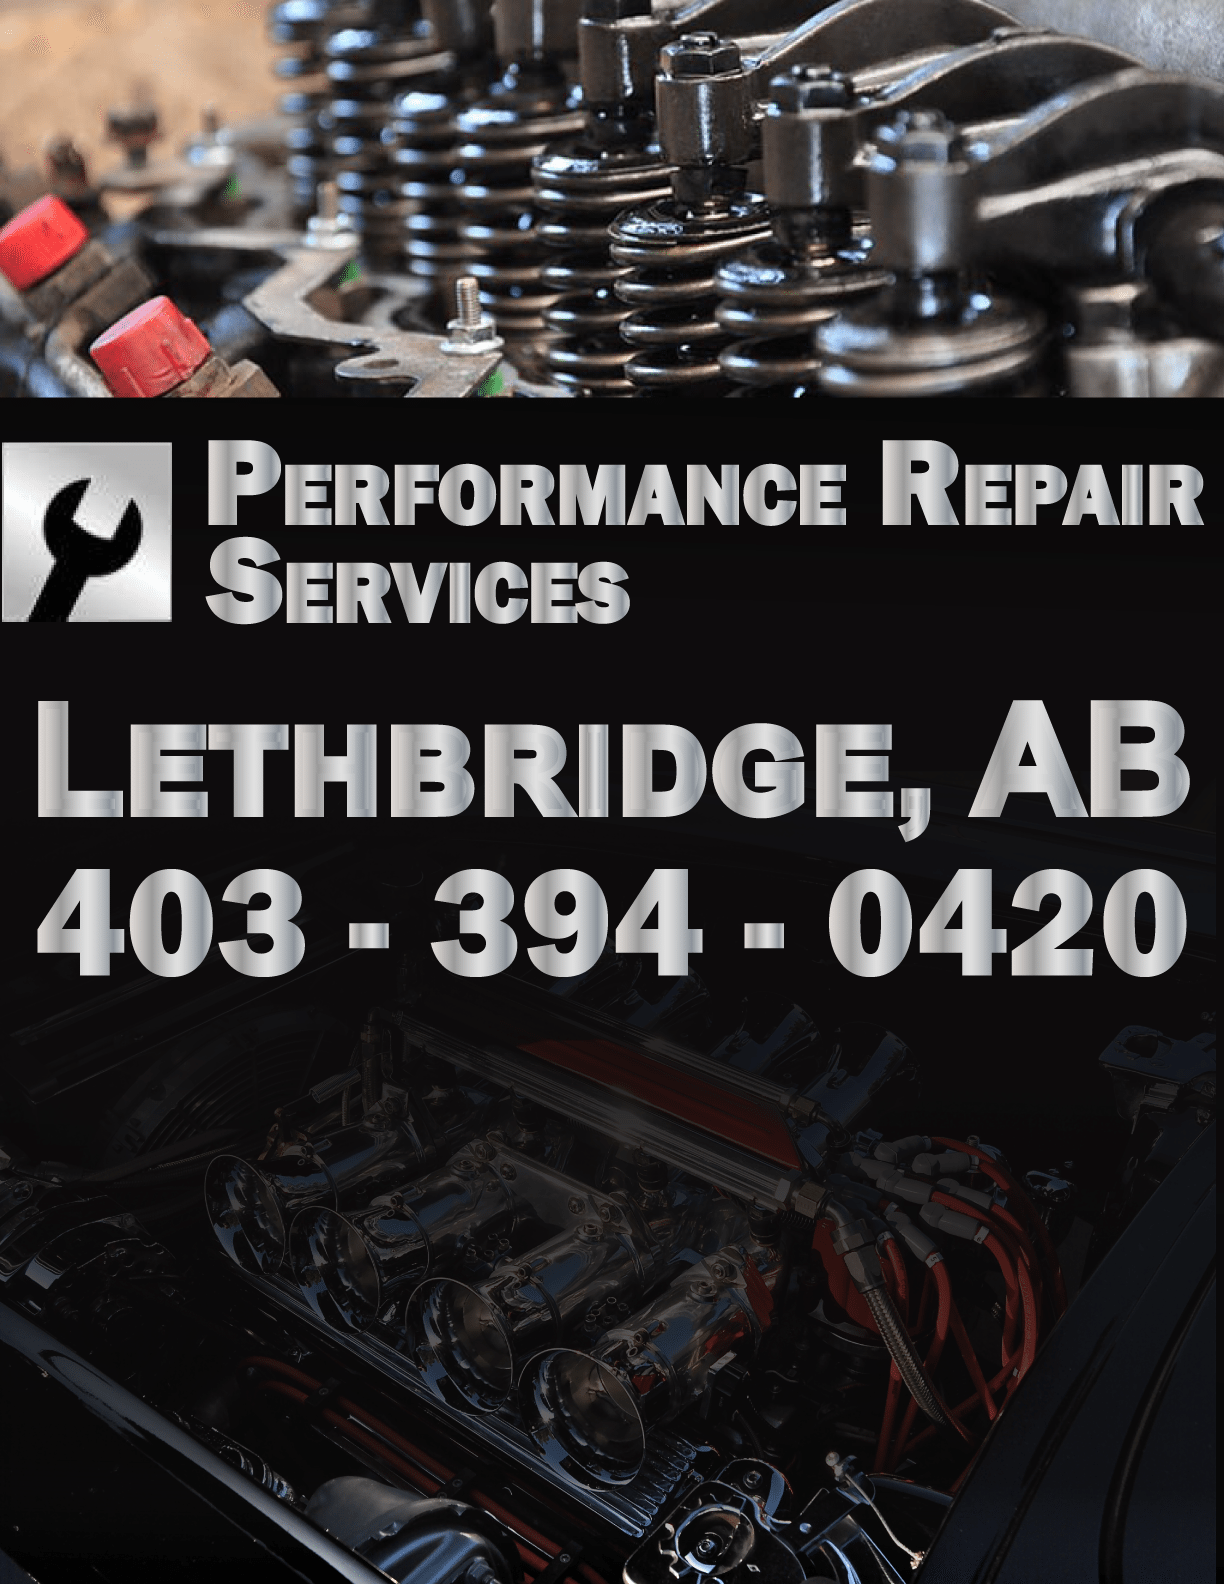 Performance Repair Services